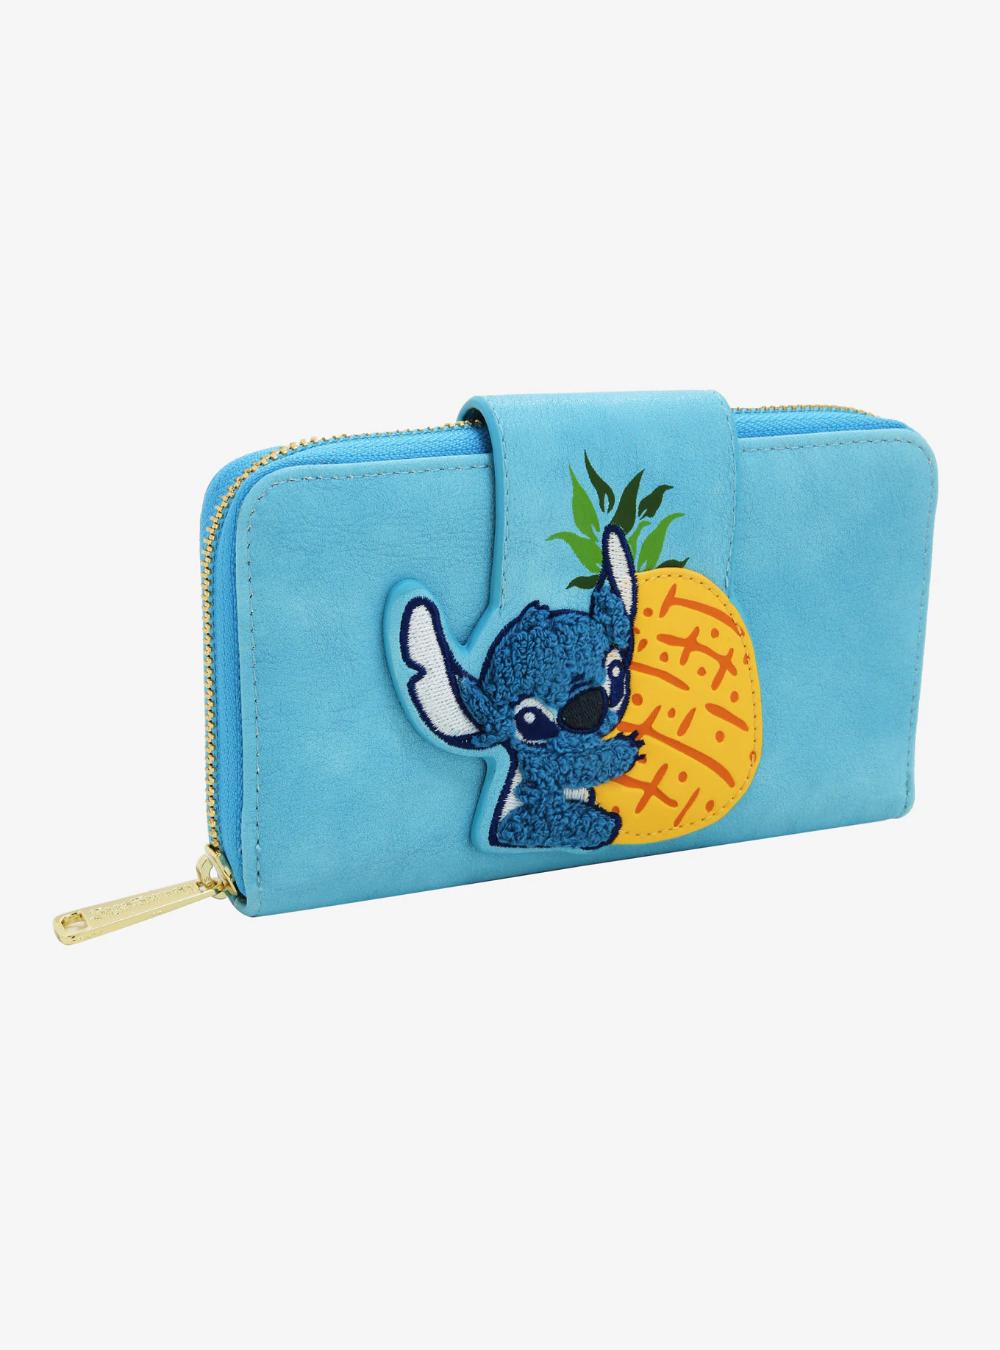 Loungefly Disney Lilo & Stitch Pineapple Stitch Zipper Wallet #liloandstitch